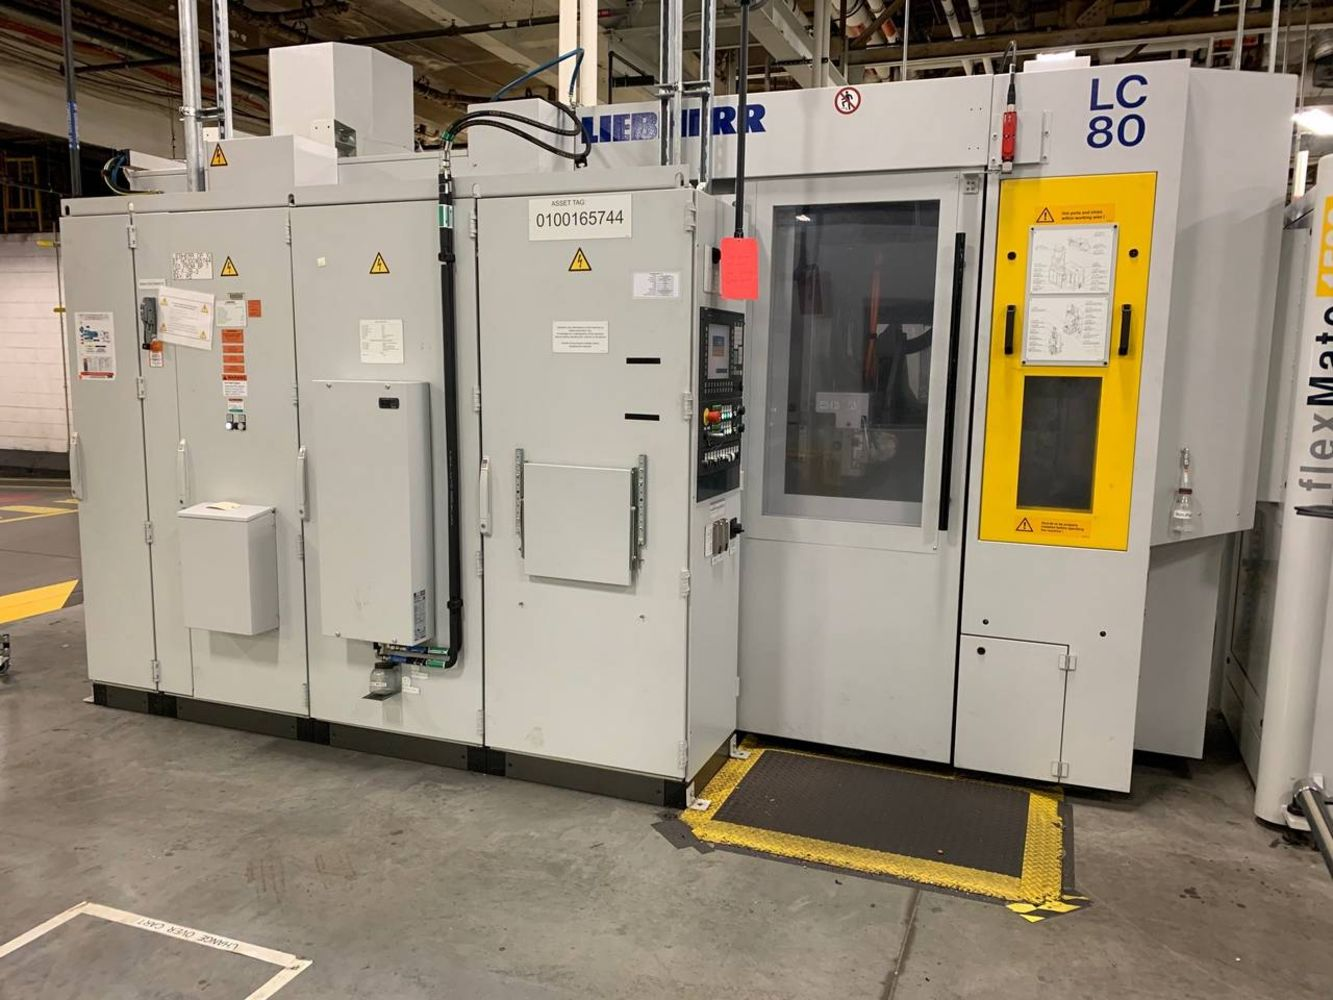 Surplus Transmission - Gear Manufacturing Assets